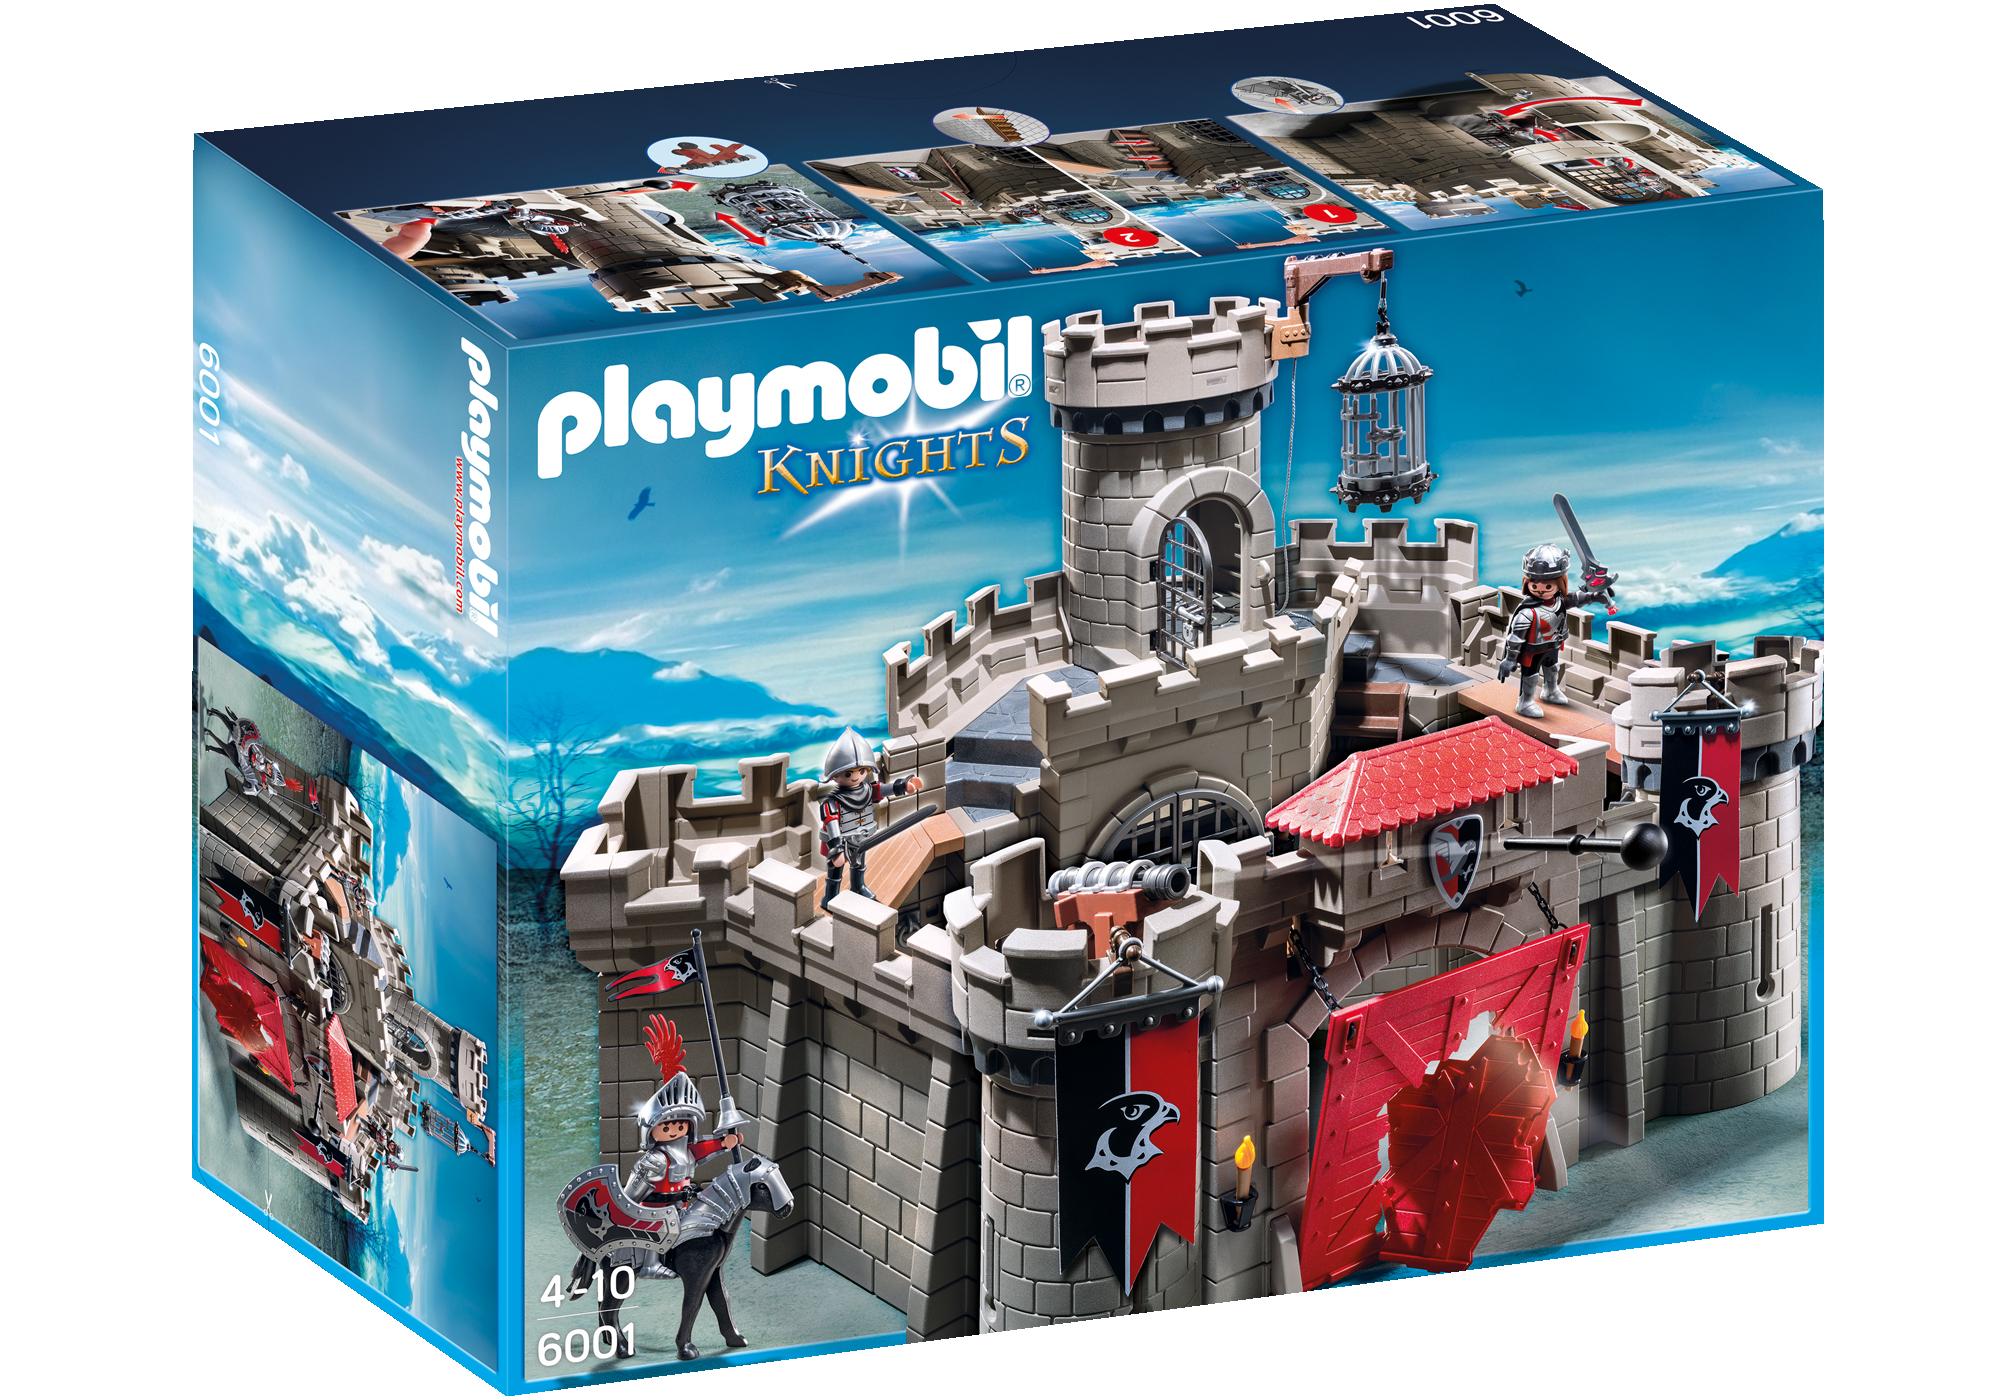 http://media.playmobil.com/i/playmobil/6001_product_box_front